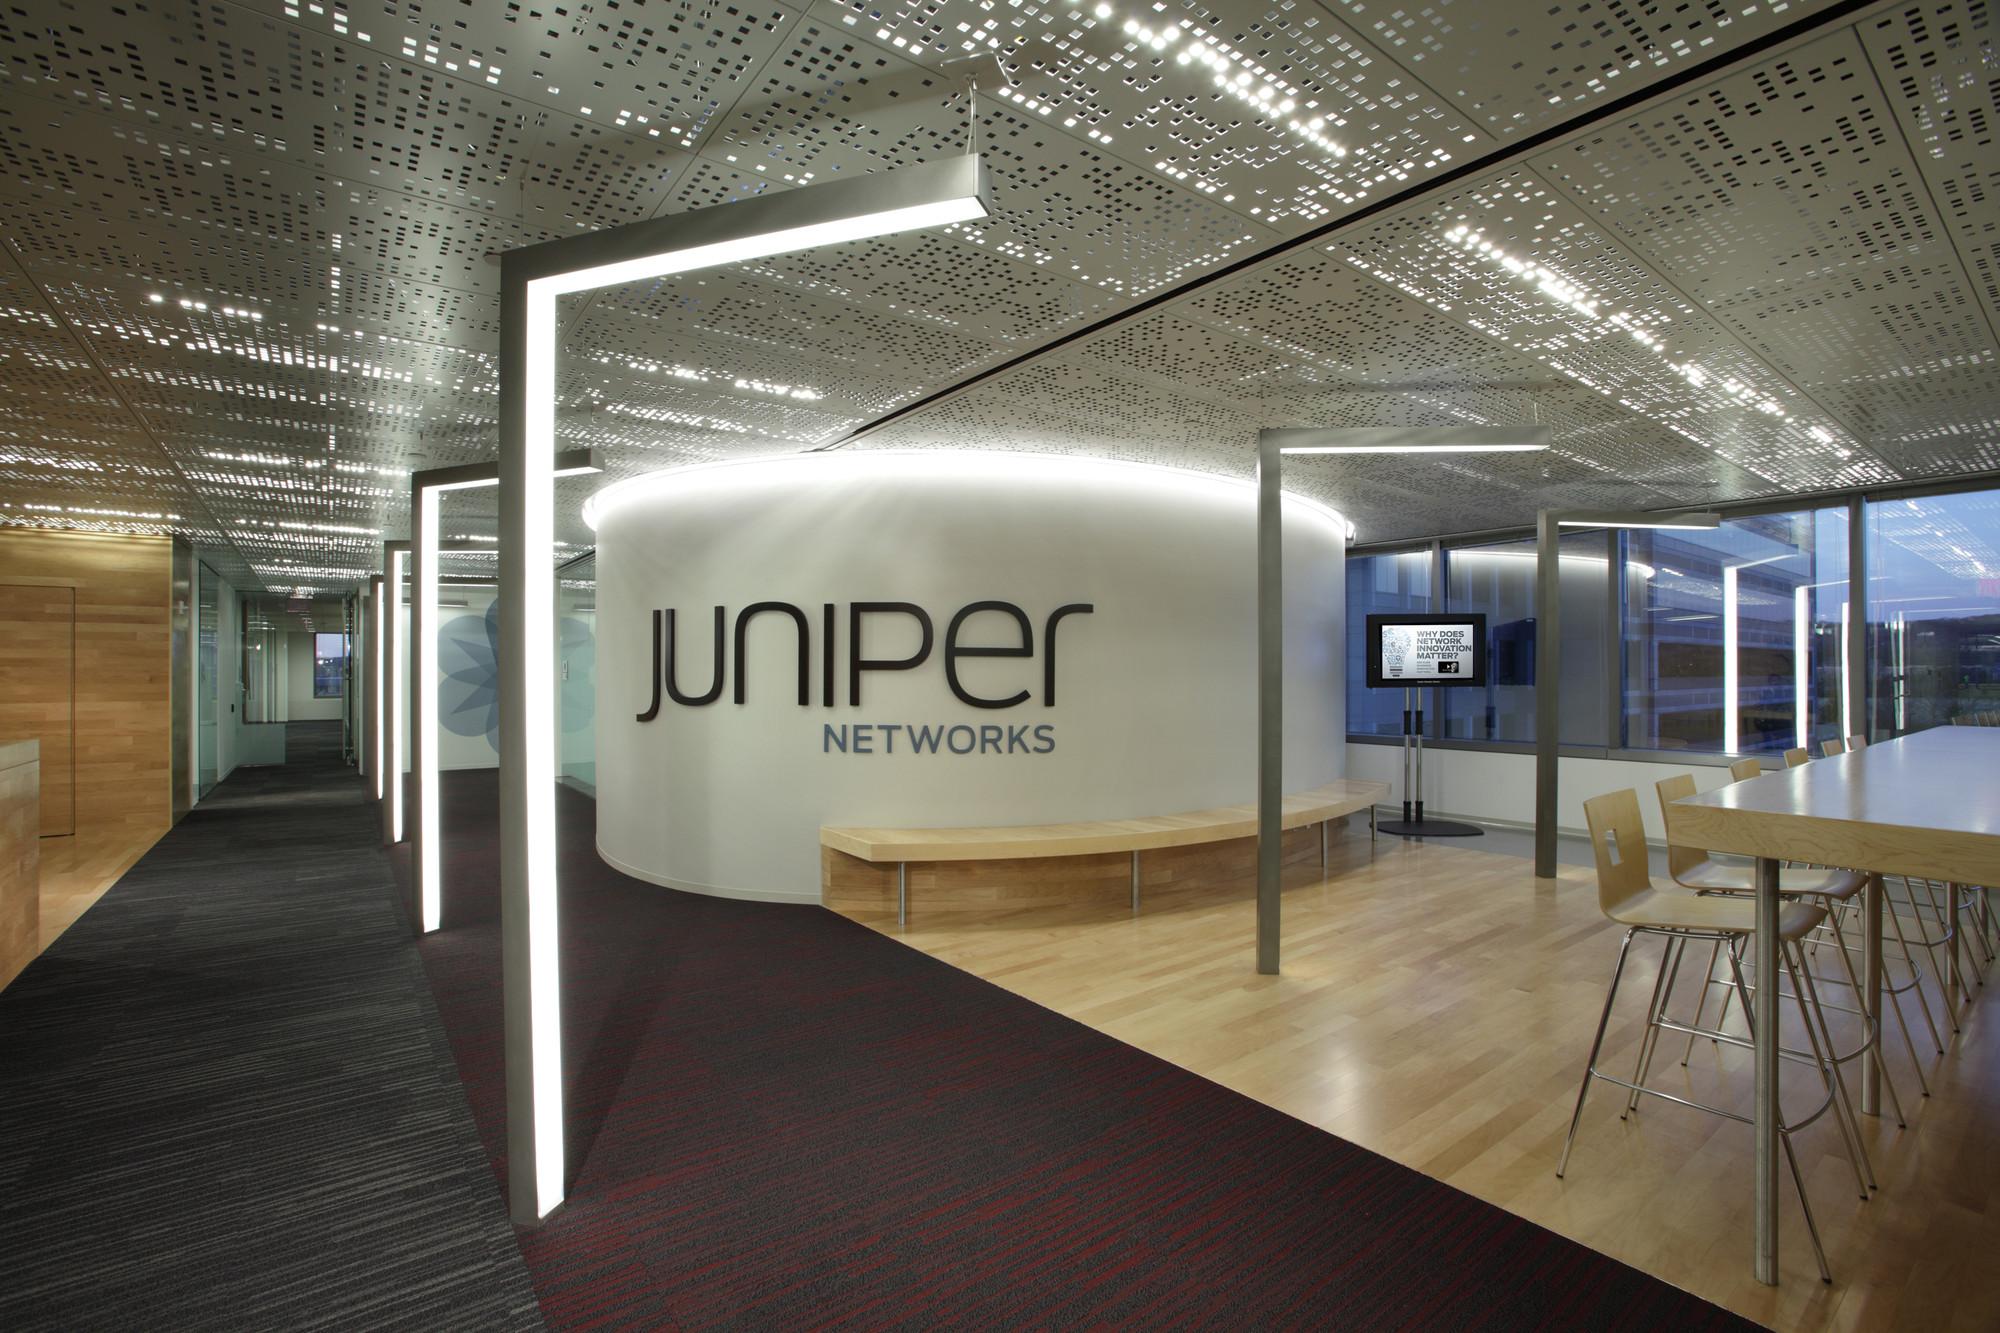 Juniper Networks / Valerio Dewalt Train Associates